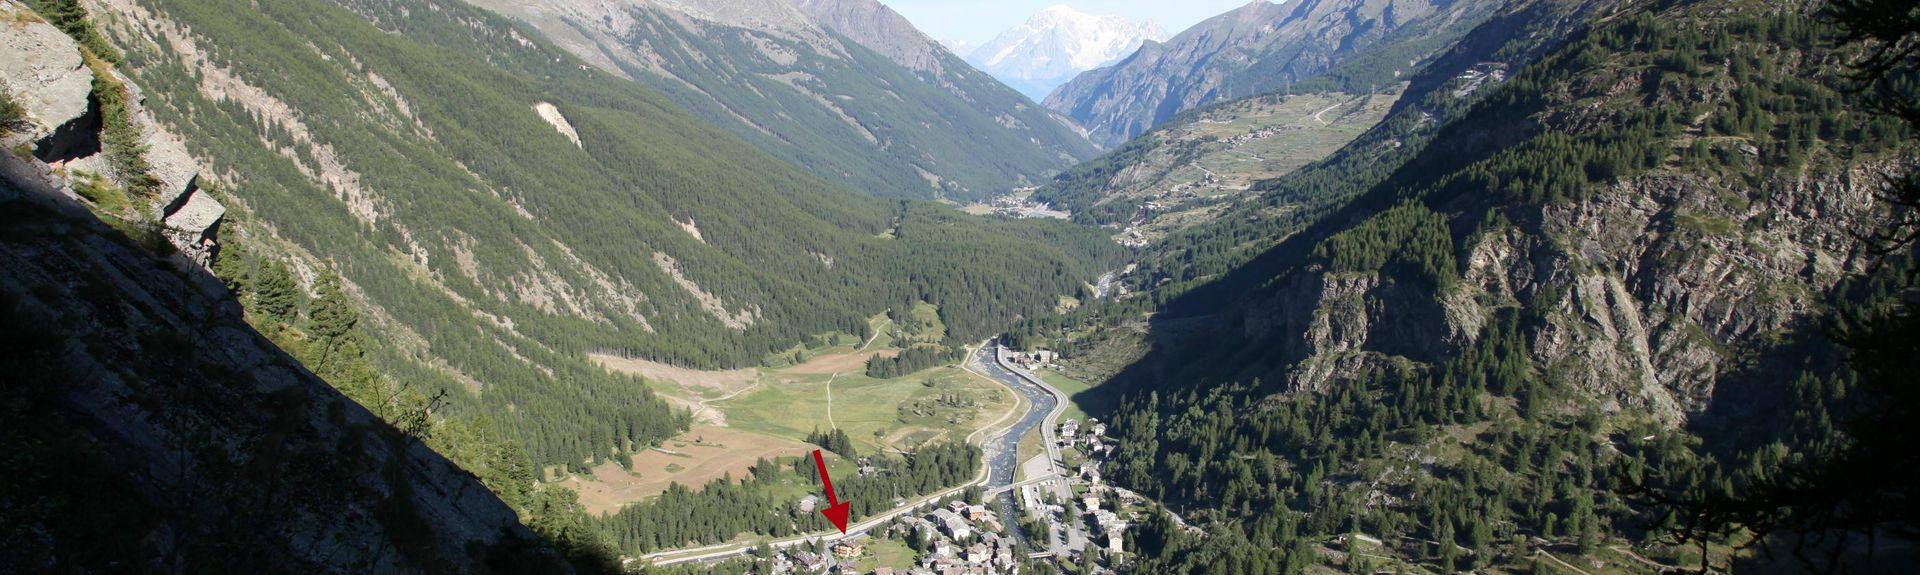 DONNAZ (Station), Donnas, Valle d'Aosta, Italy